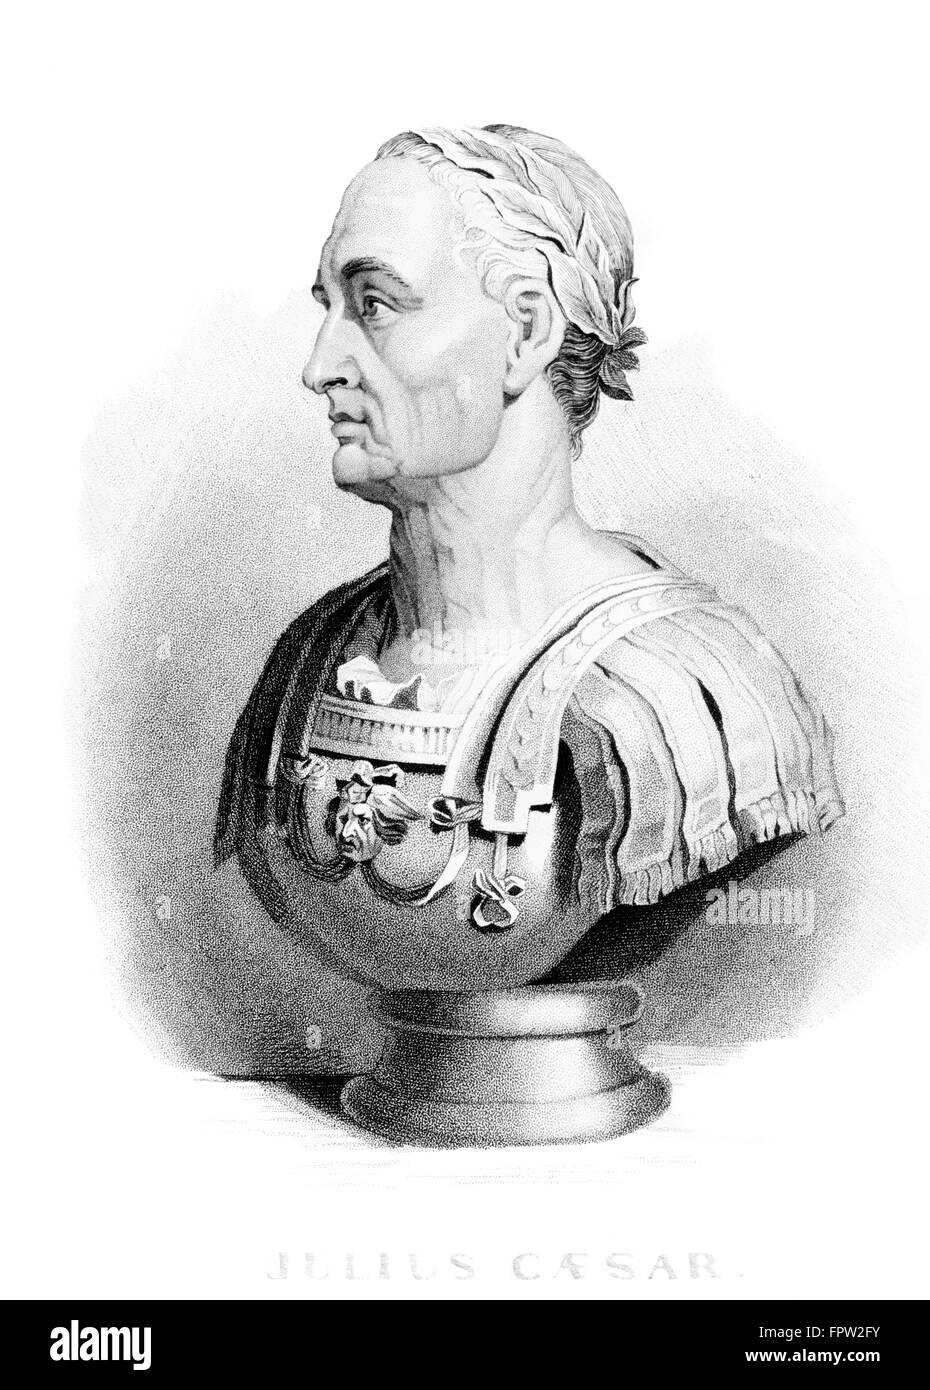 BUST GAIUS JULIUS CAESAR PROFILE ROMAN EMPIRE GENERAL STATESMAN DICTATOR MURDERED 44 BCE ON MARCH 15 BEWARE IDES - Stock Image